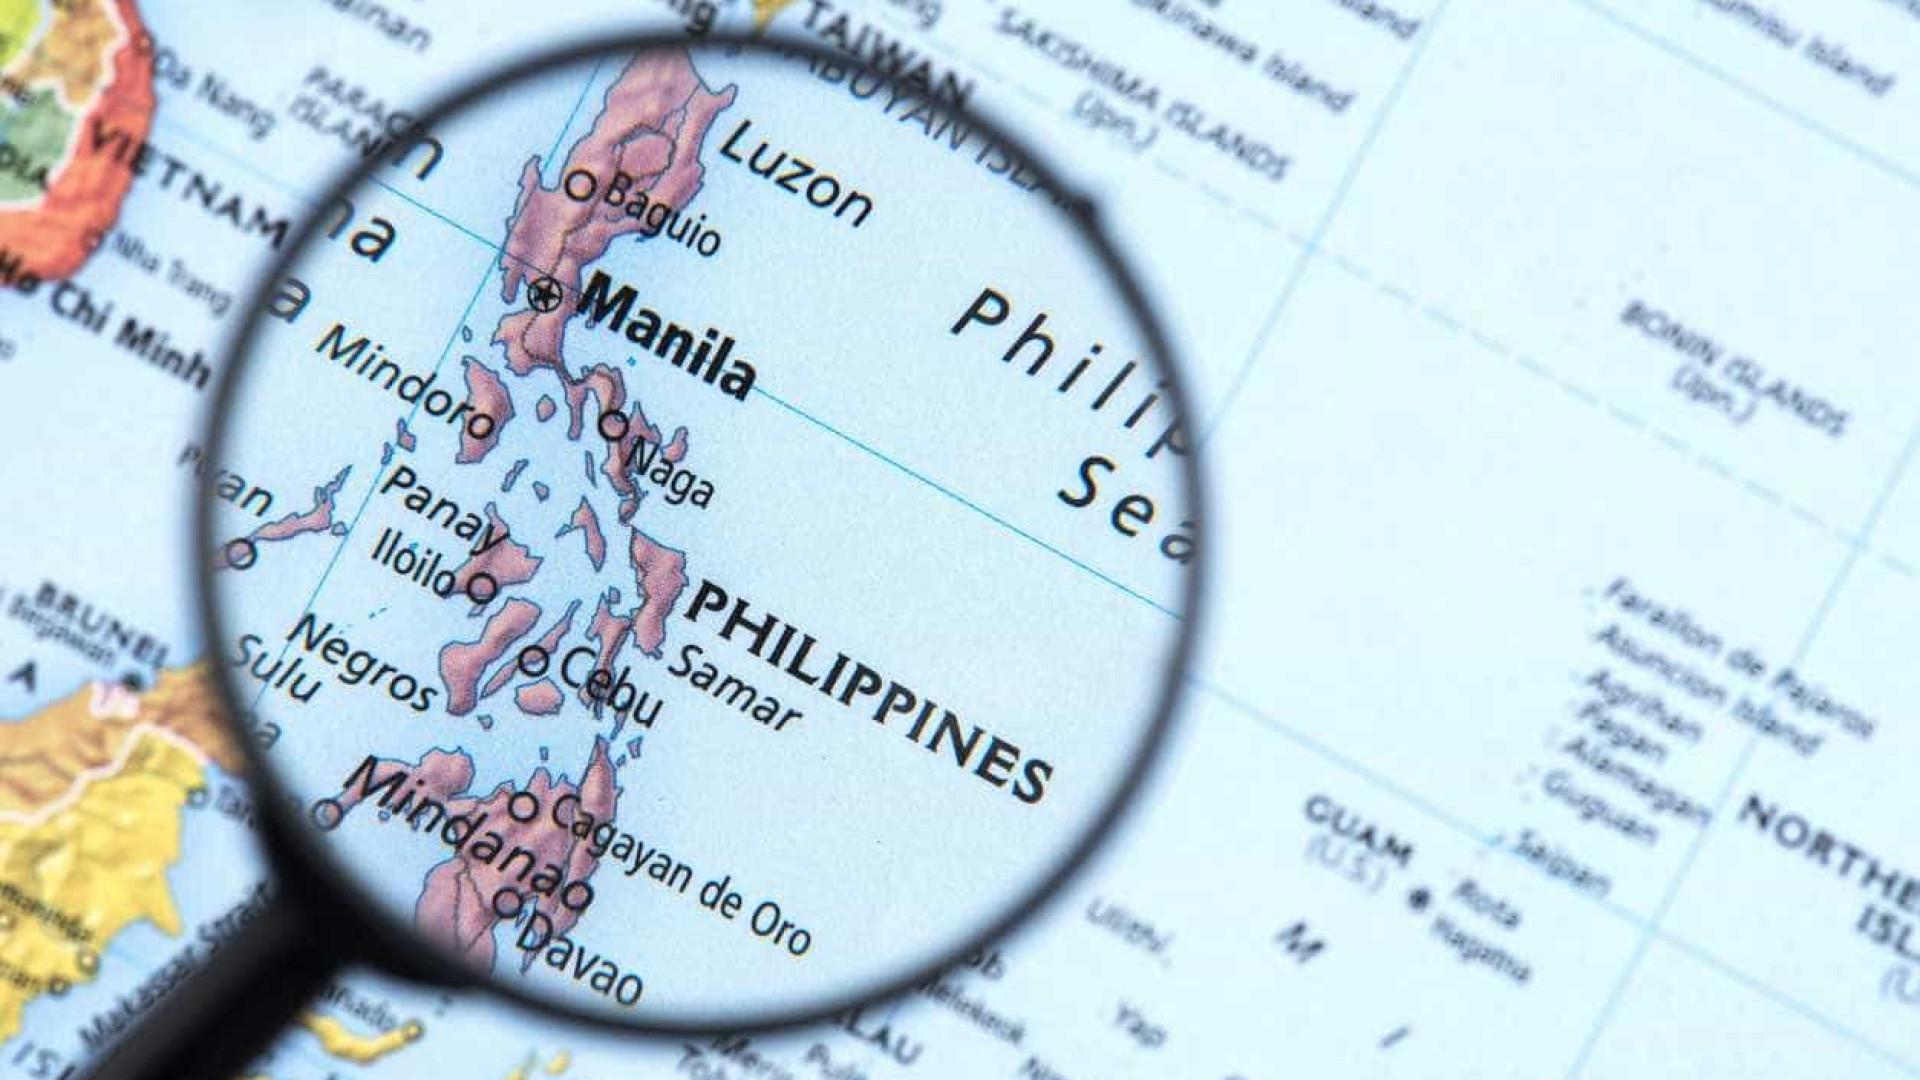 Exército filipino controla centro de comando dos 'jihadistas' em Marawi